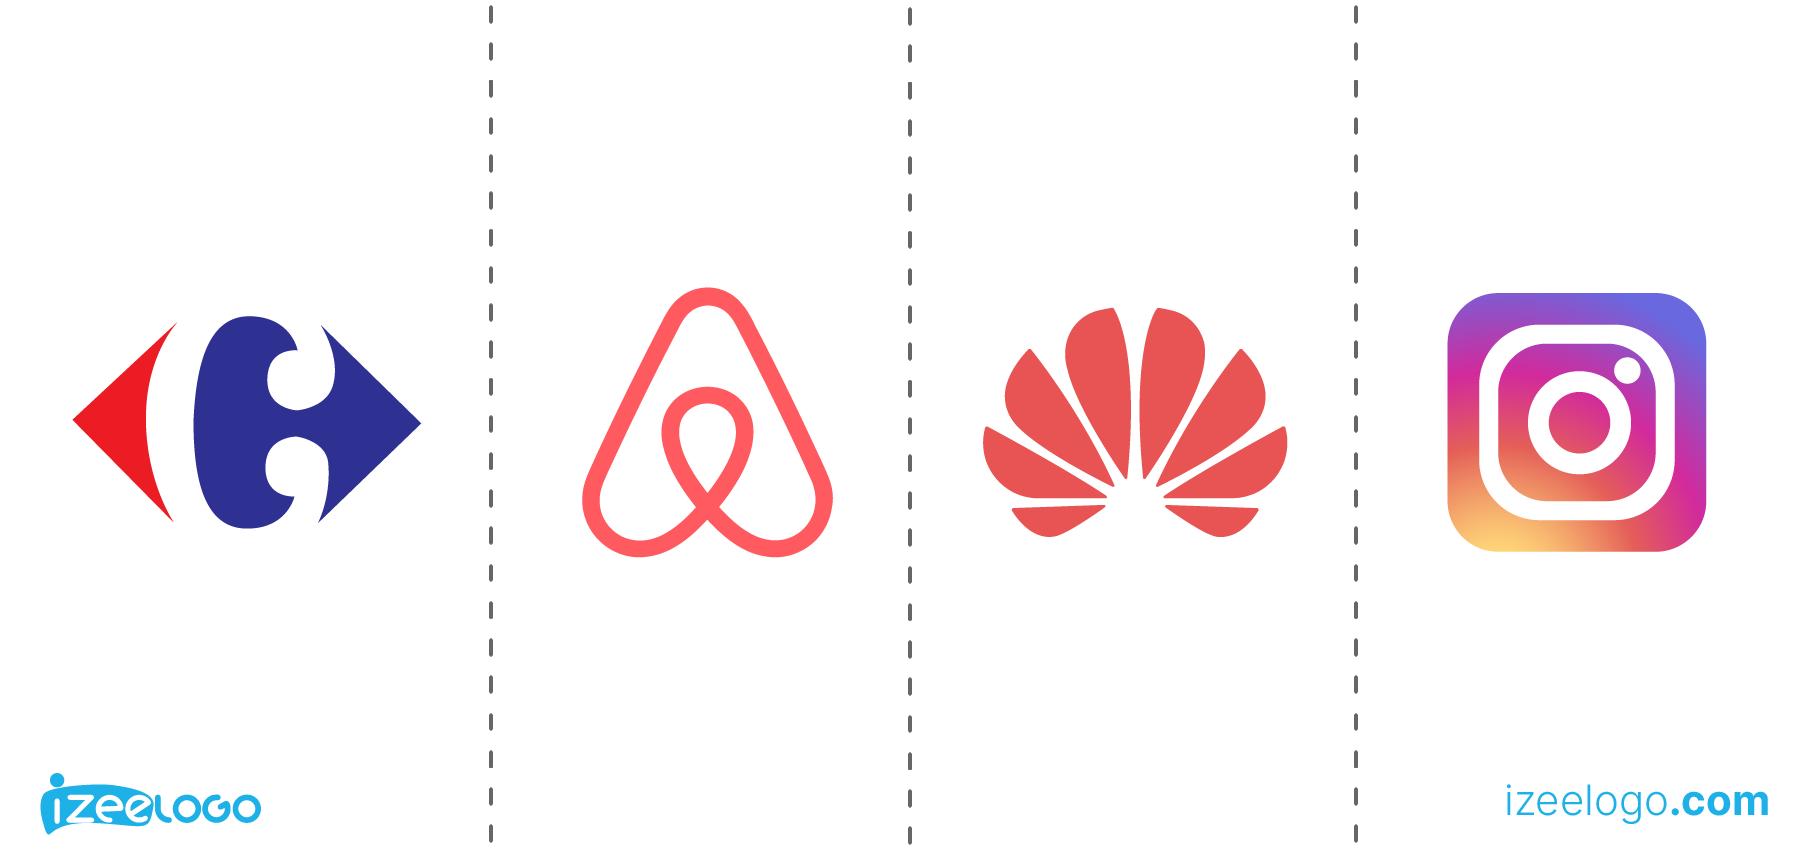 Exemples de logo abstrait : logo Carrefour PNG, logo Airbnb PNG, logo Huawei et logo Instagram PNG.